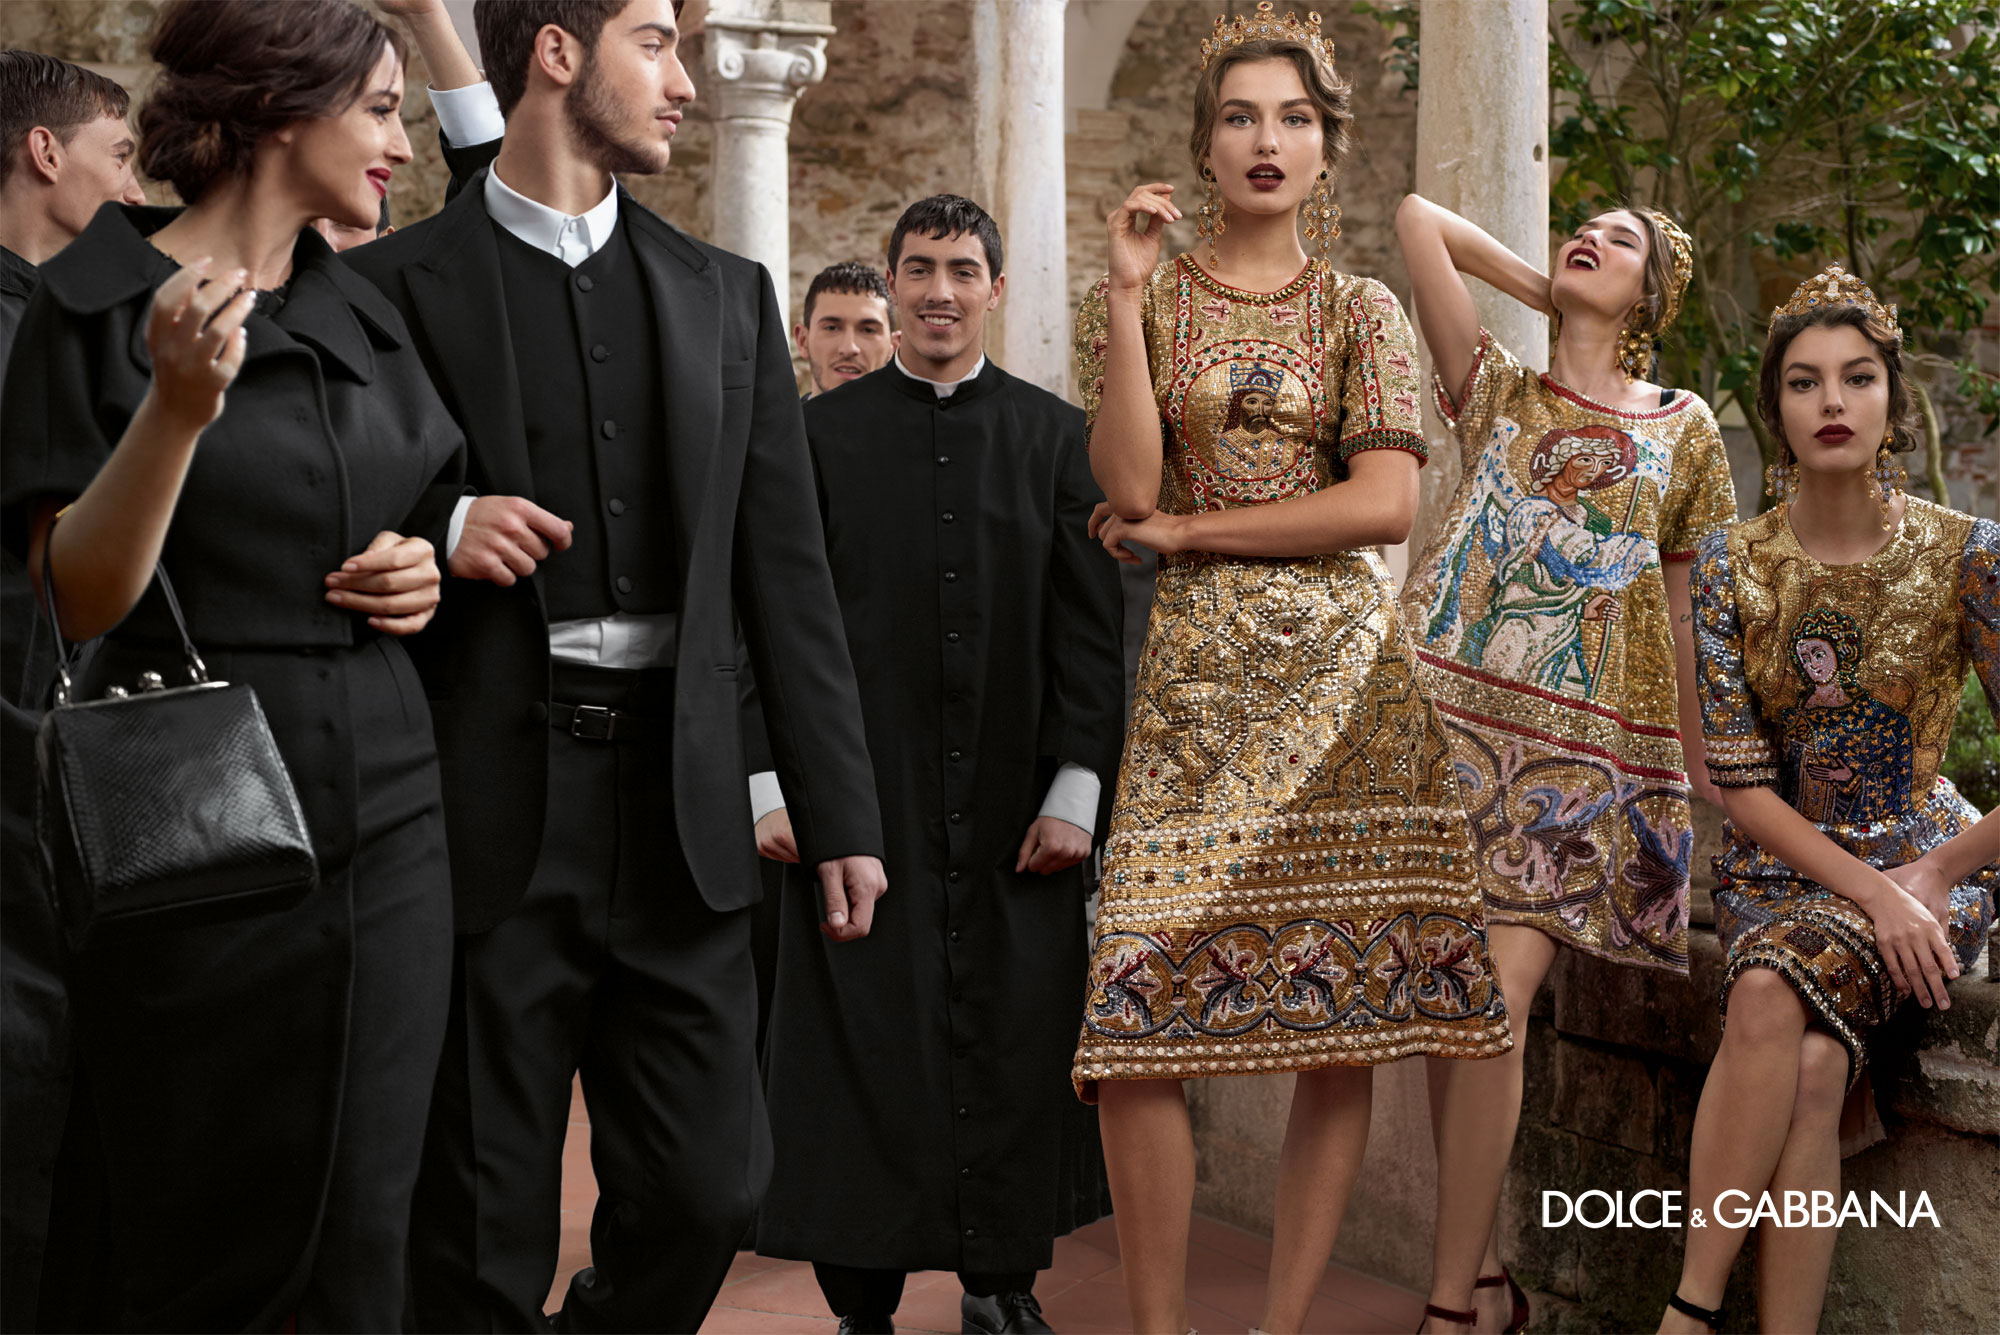 dolce-and-gabbana-fw-2014-women-adv-campaign-7.jpg